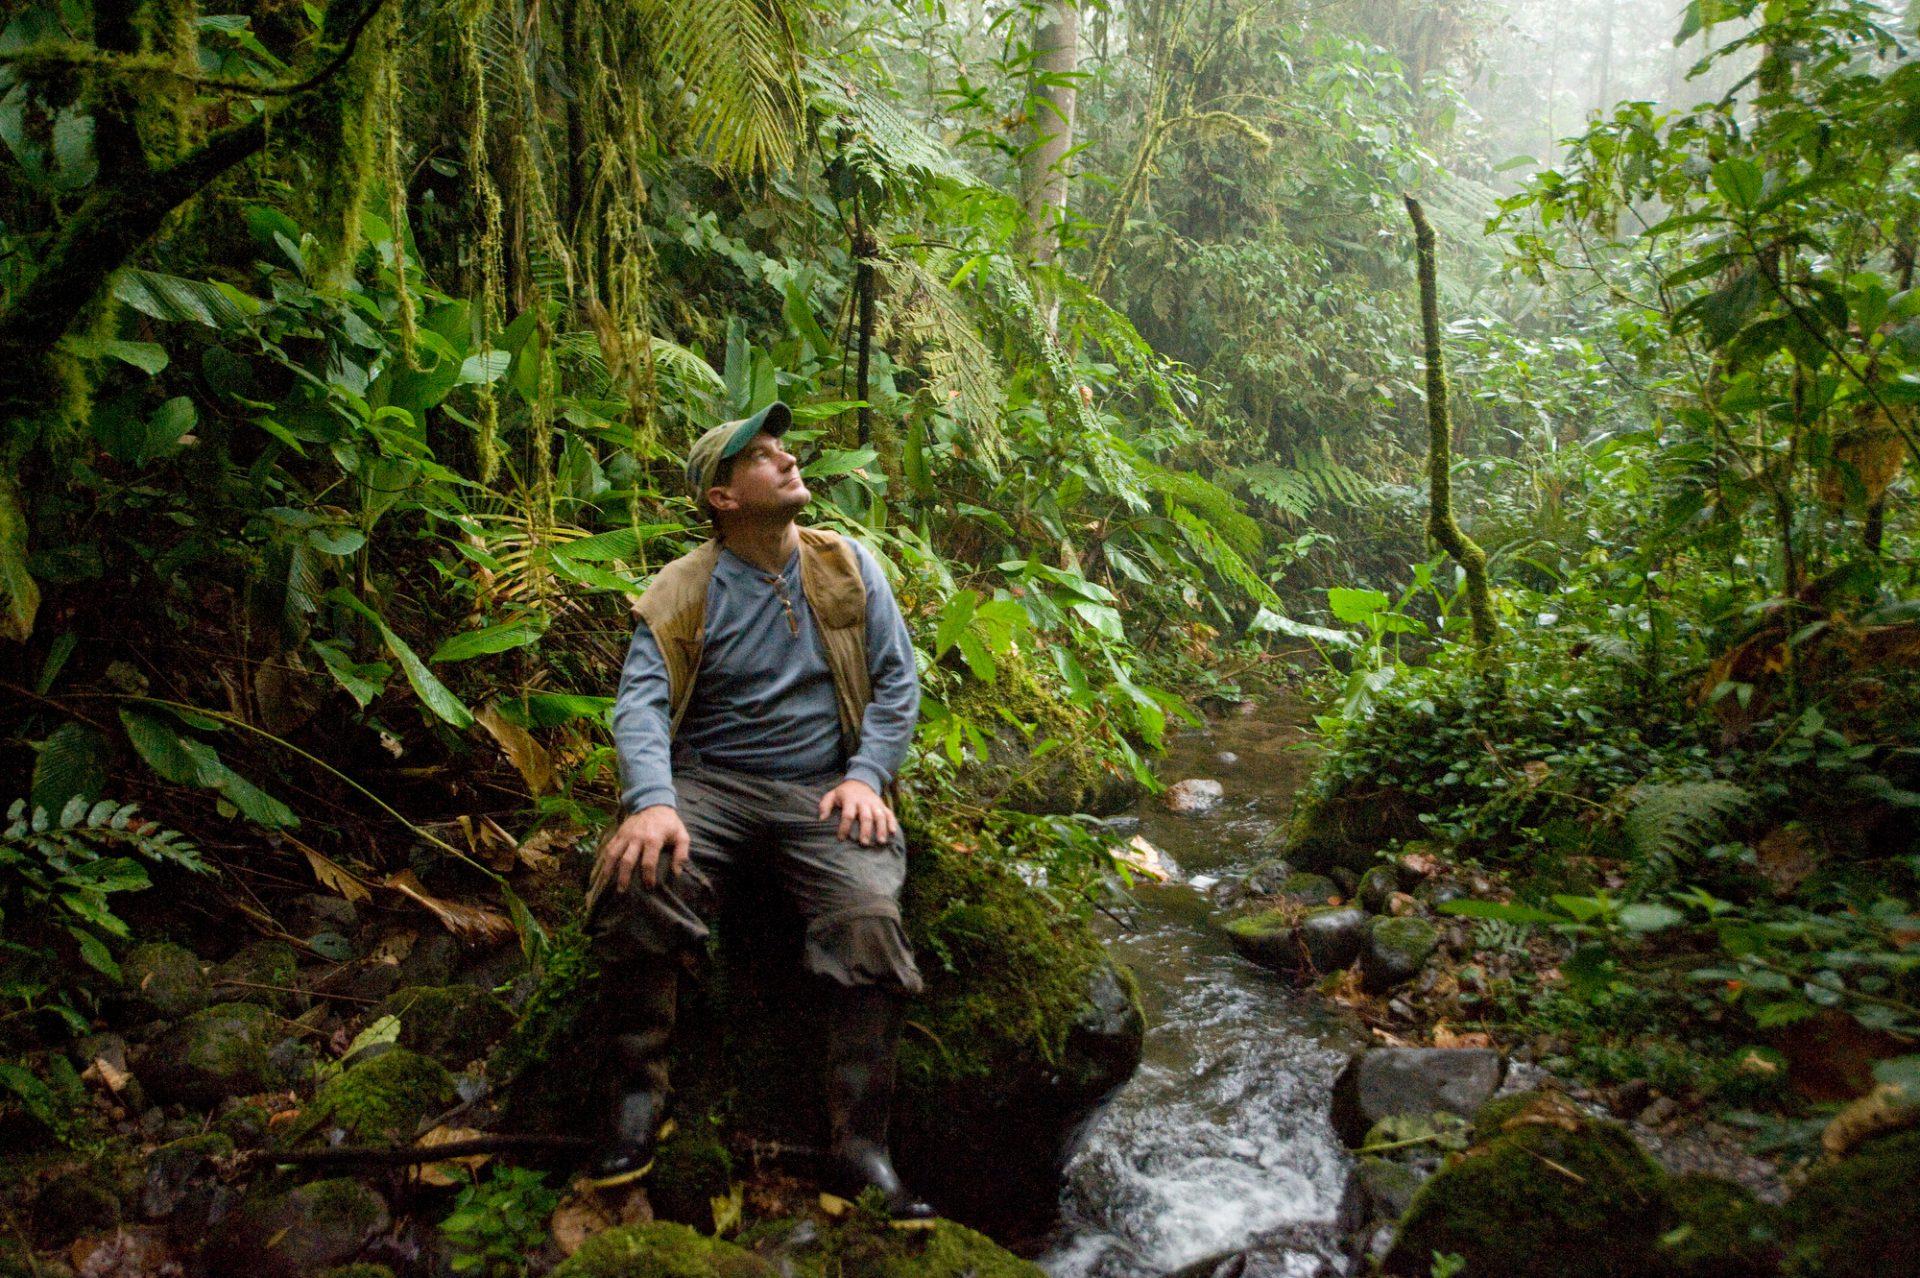 Photo: Joel Sartore in the cloud forest reserve near Mindo, Ecuador.